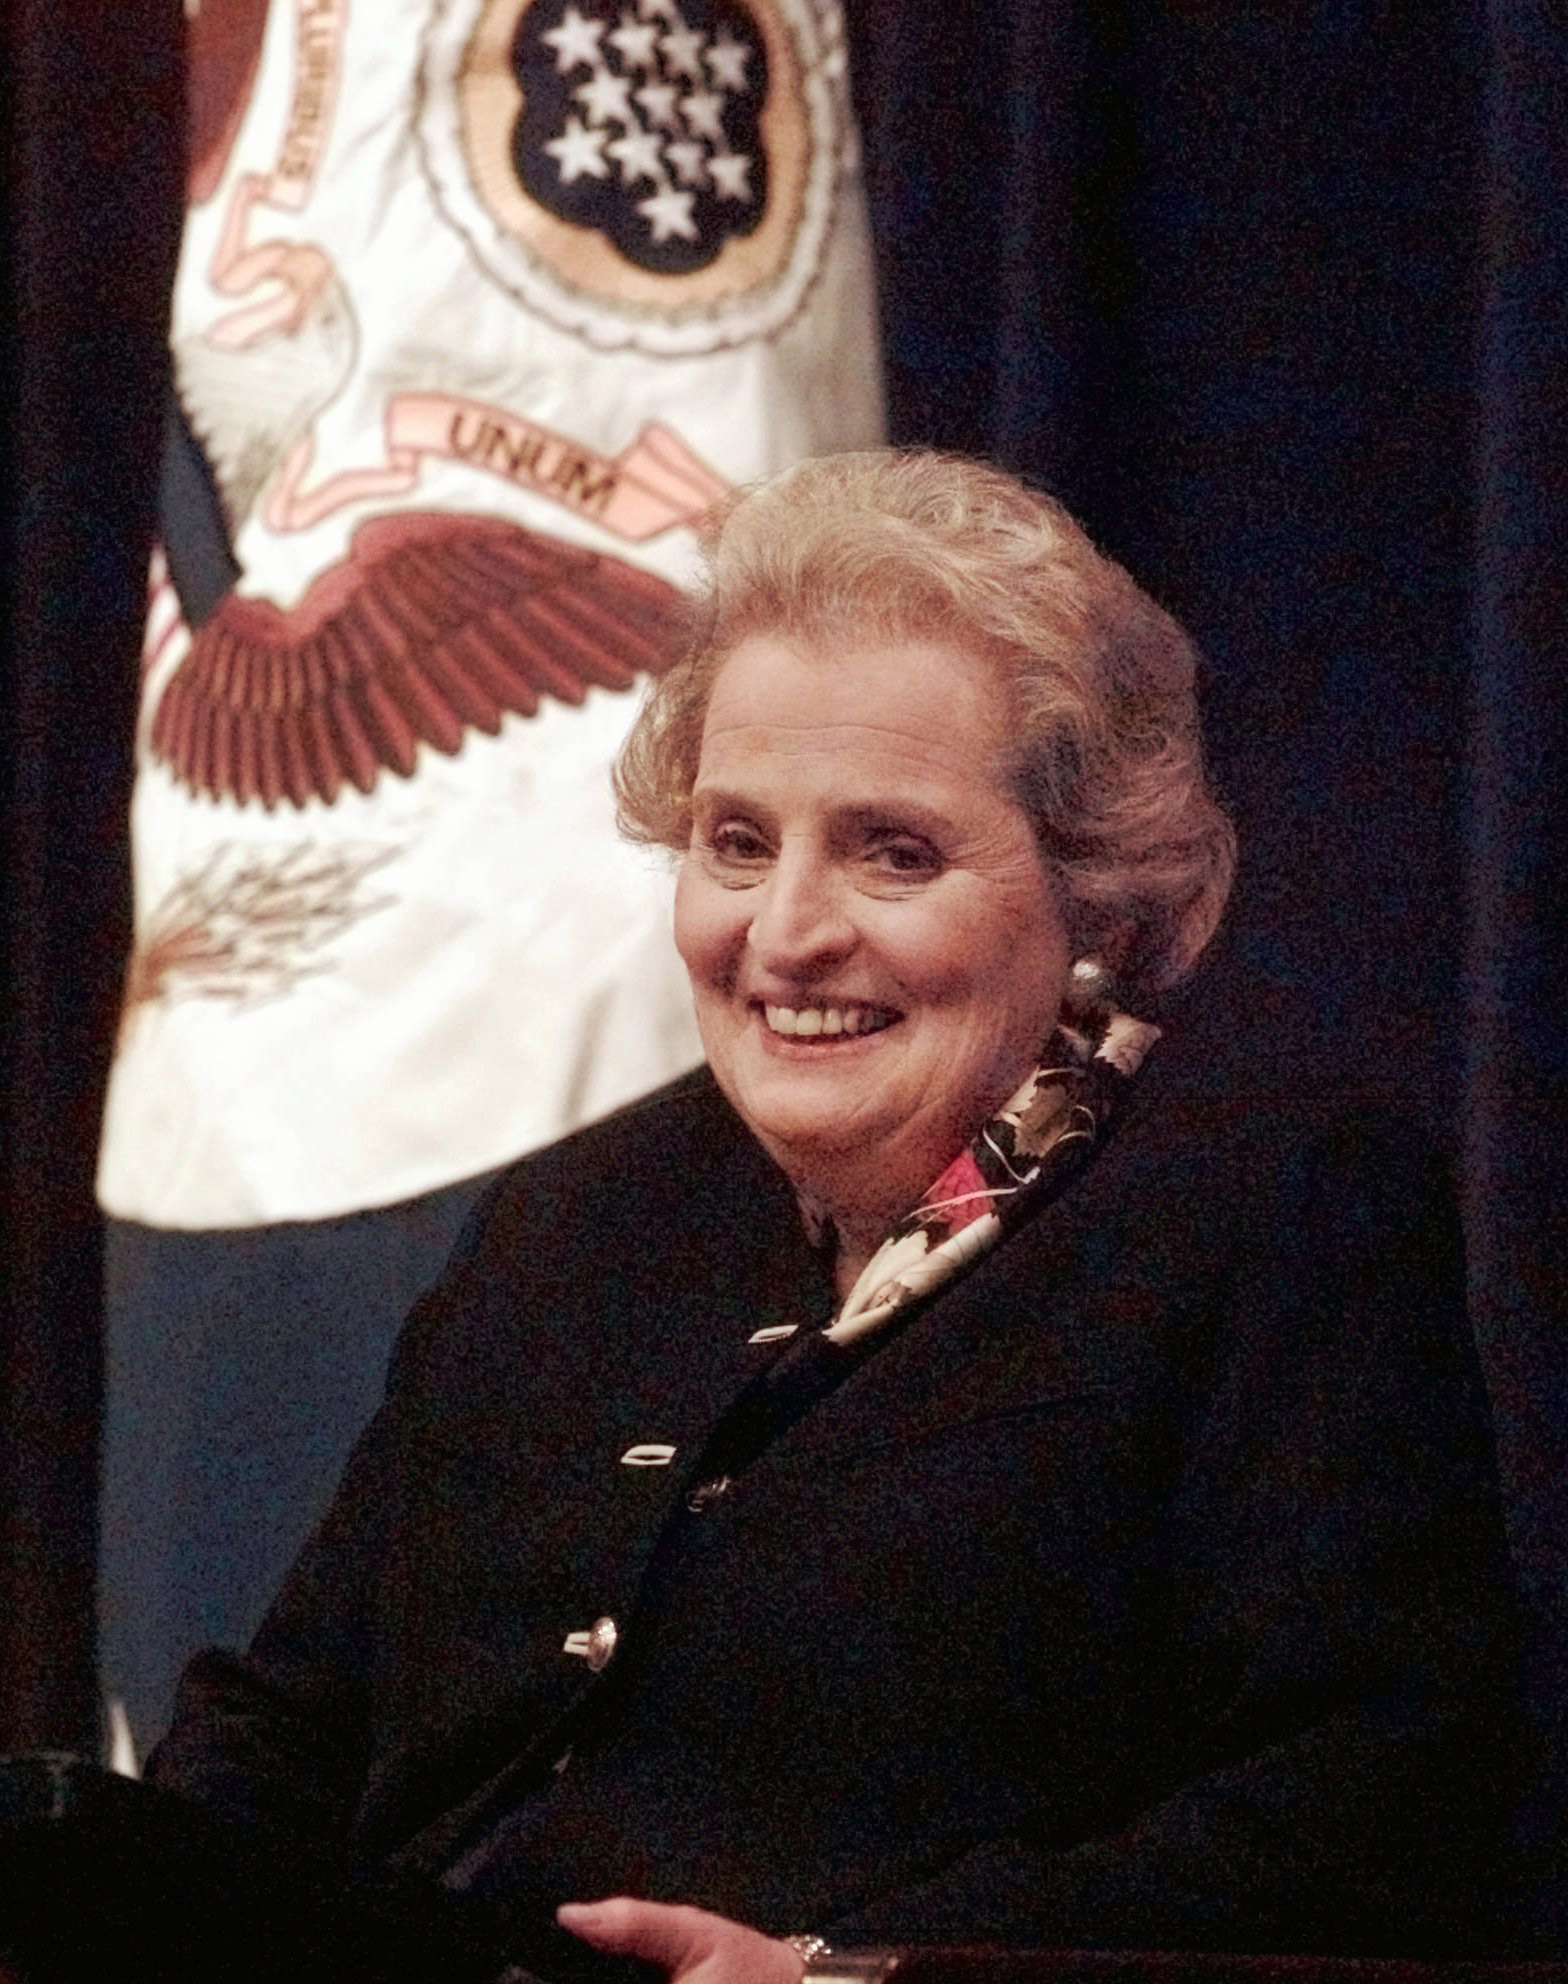 Secretary of State Madeleine Albright smiles while meeting with State Department employees during a town hall meeting at the State Department in Washington Monday Jan. 27, 1997.